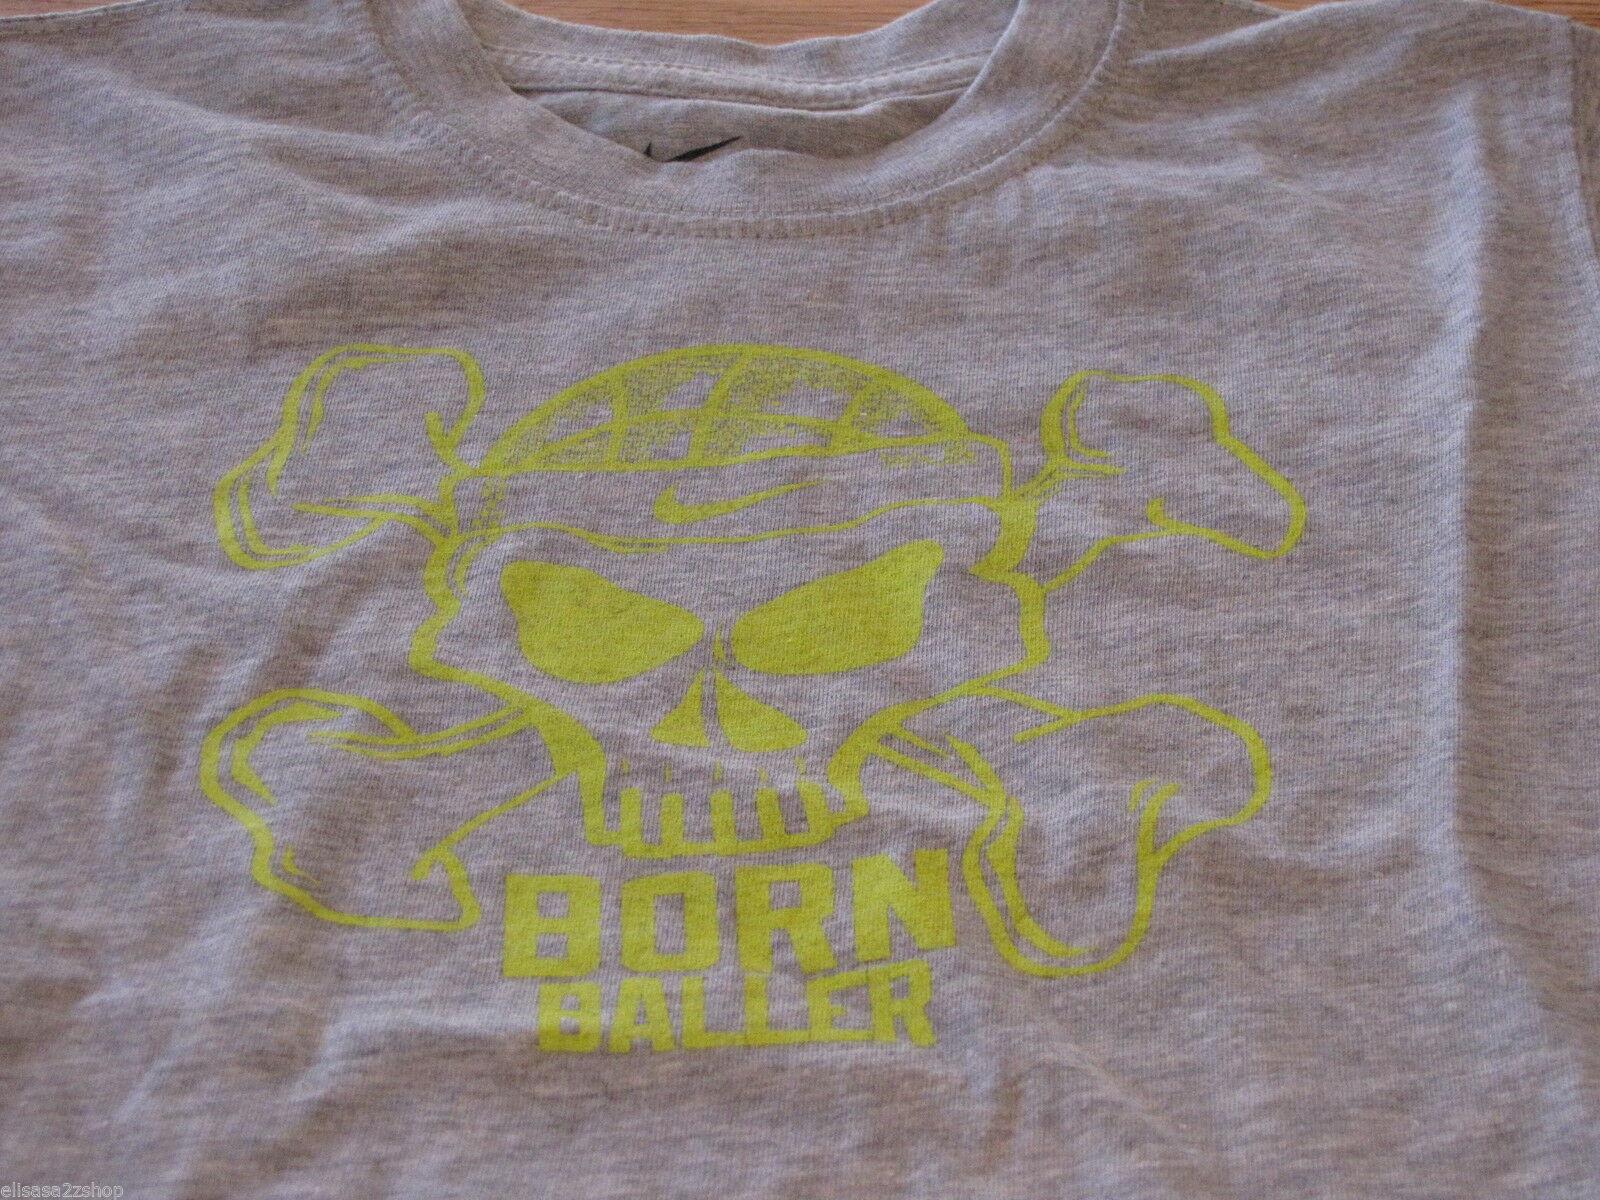 Boy's Youth 2T Nike born Baller smack talk sports grey T shirt TEE NEW NWT logo